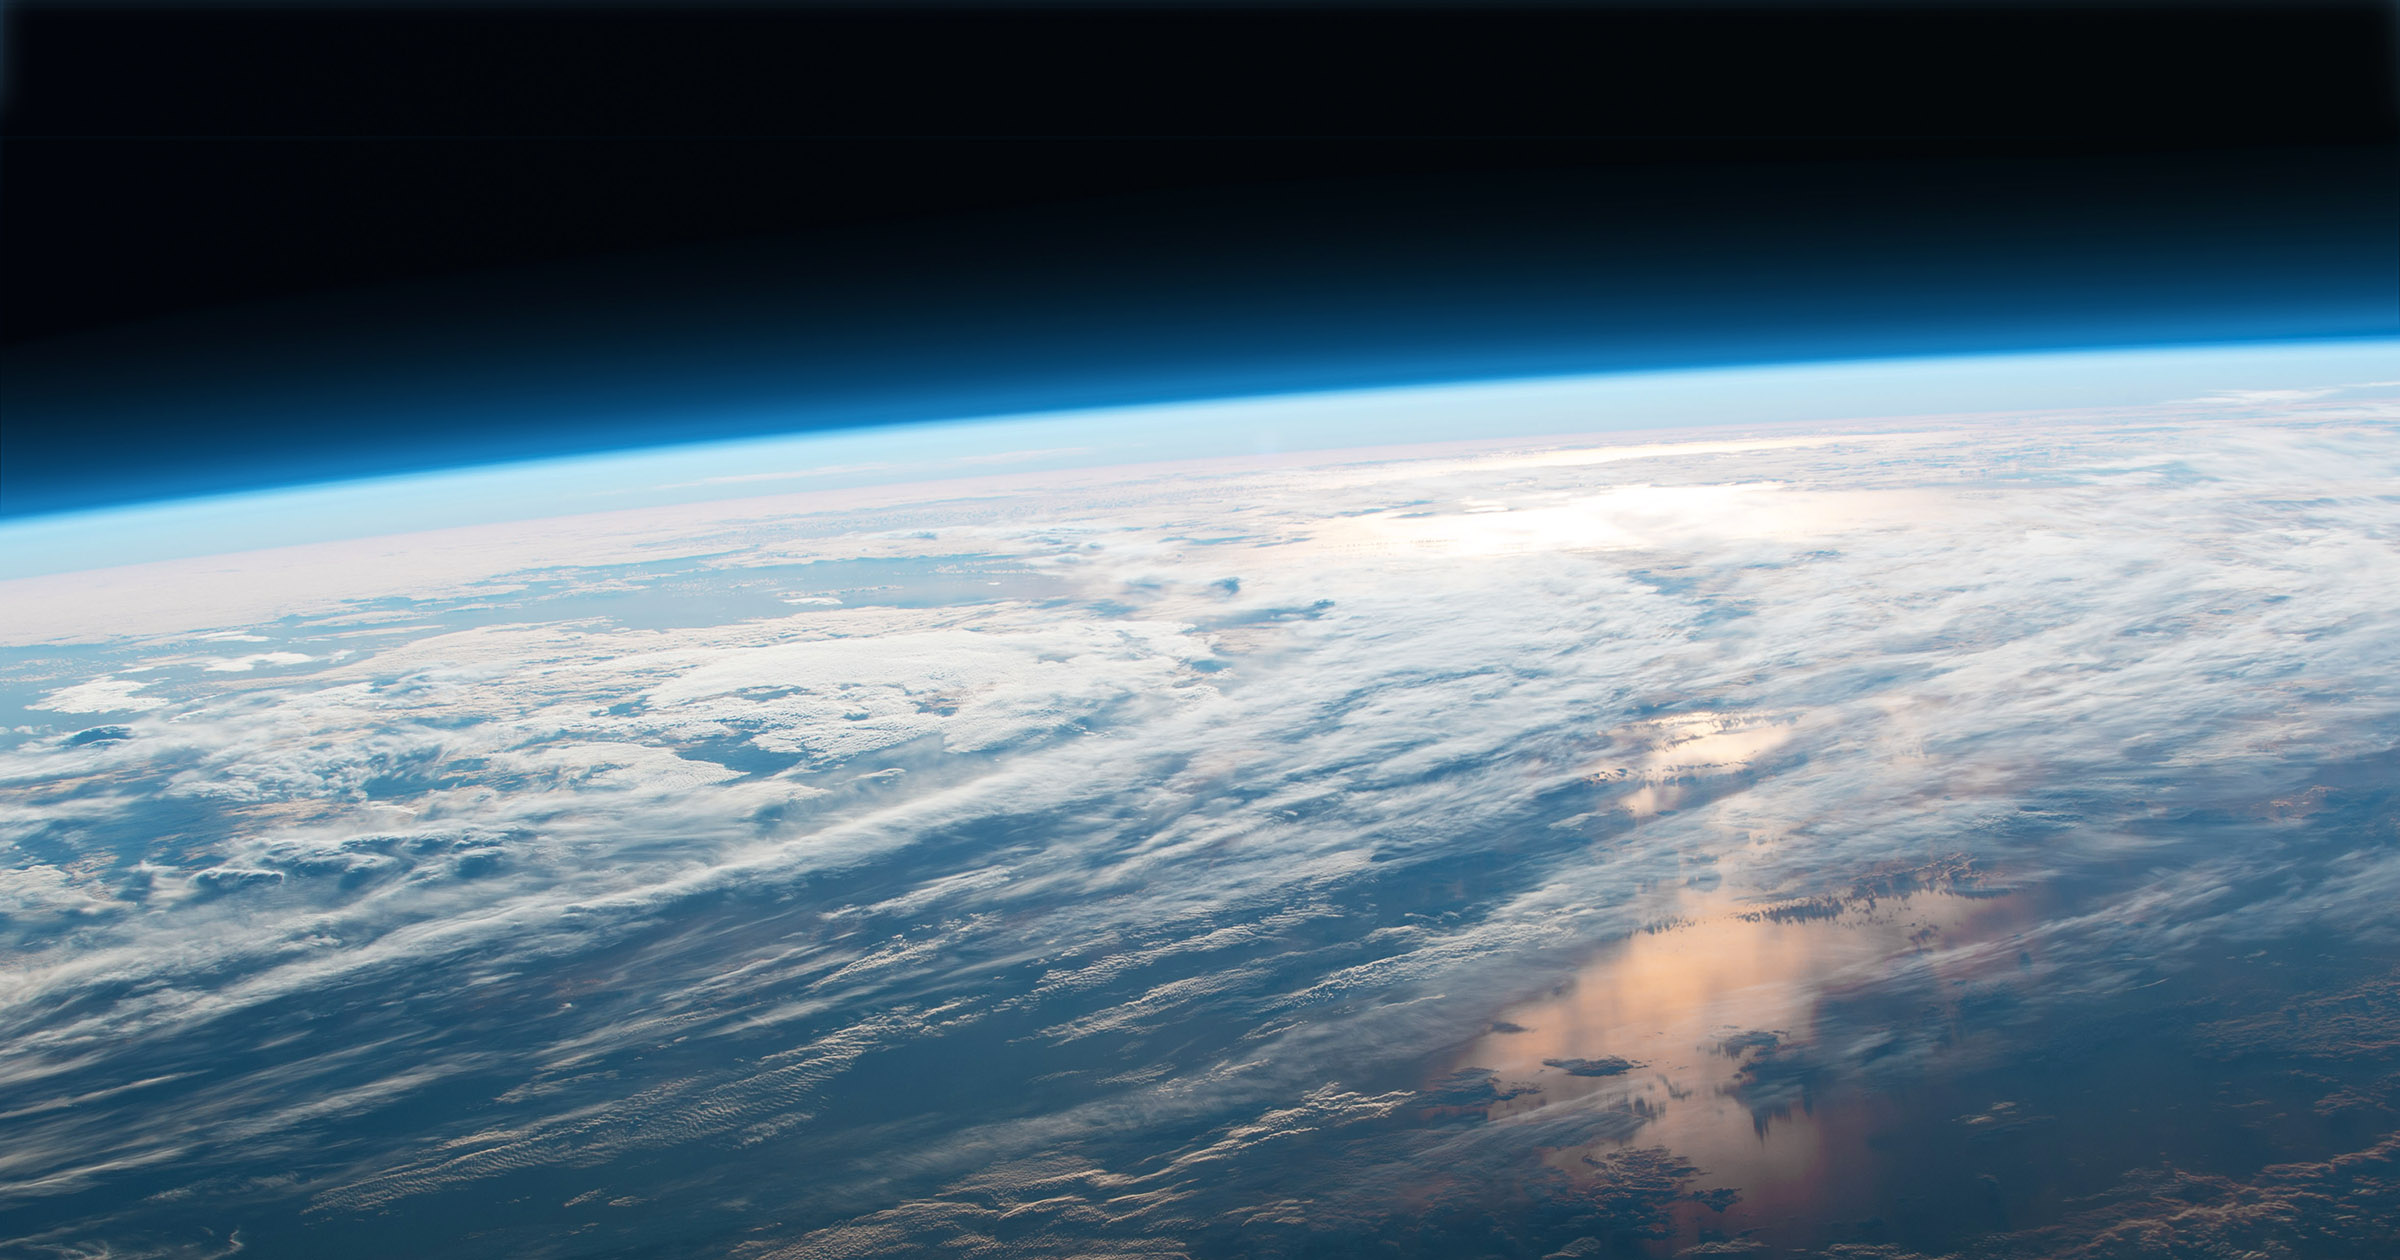 Risultati immagini per atmosphere